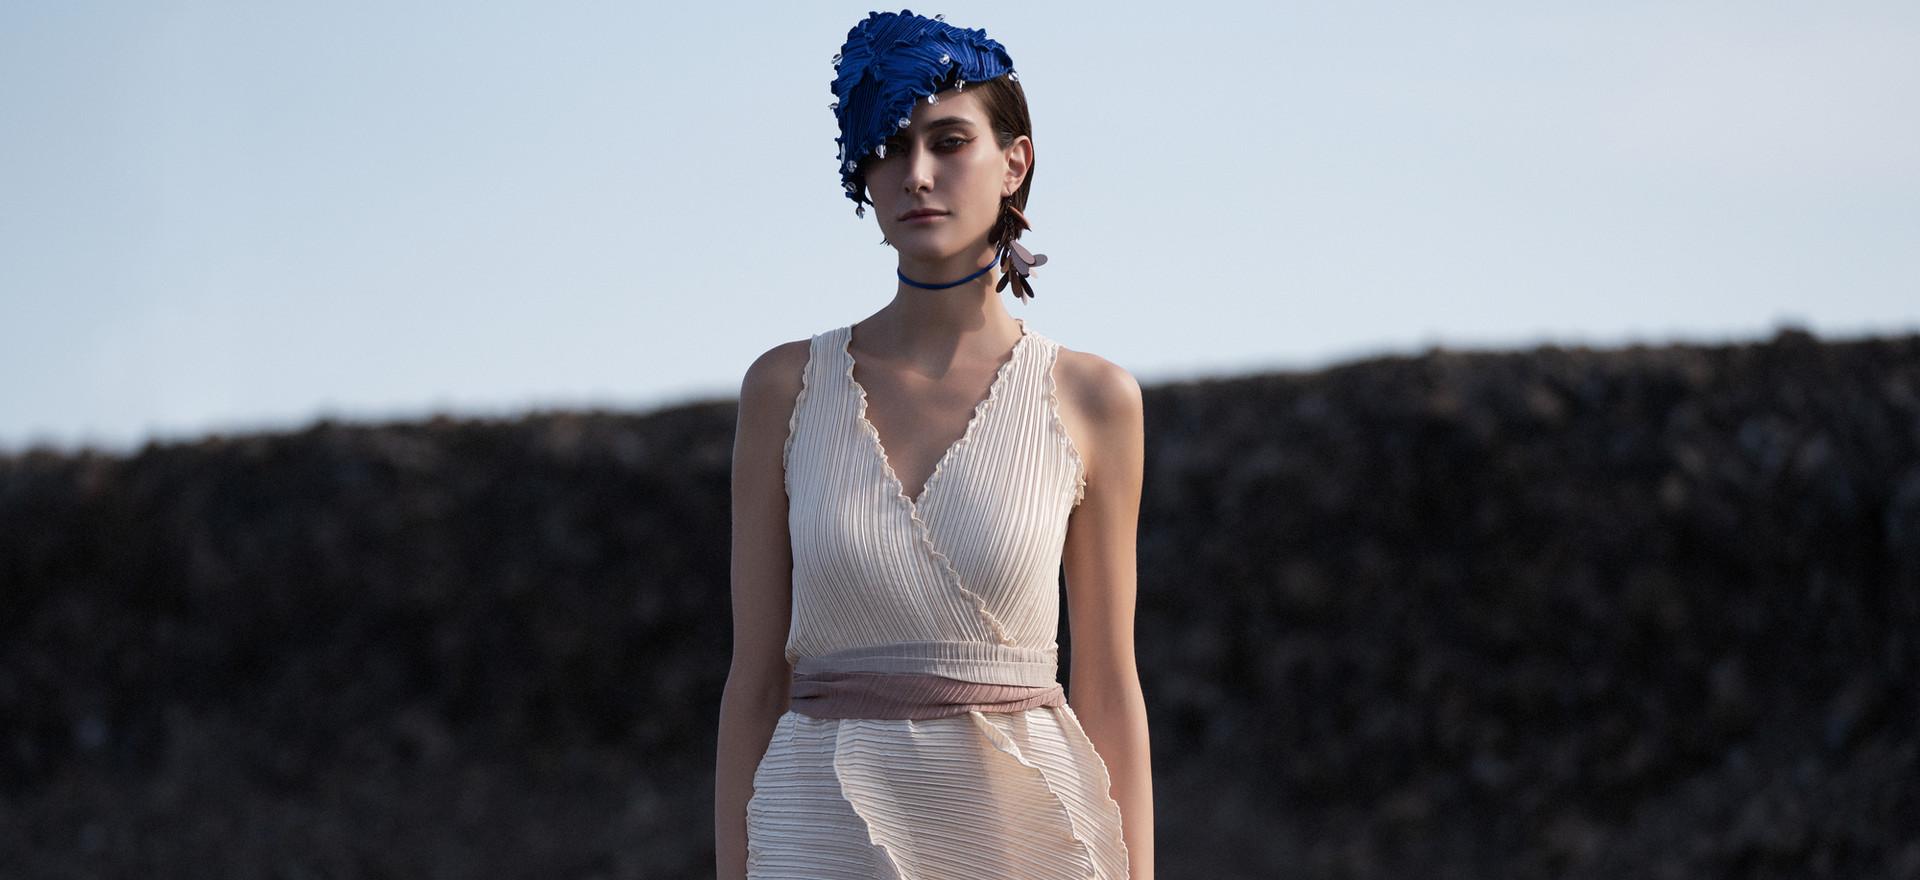 Helix Dress & Ergon Bag